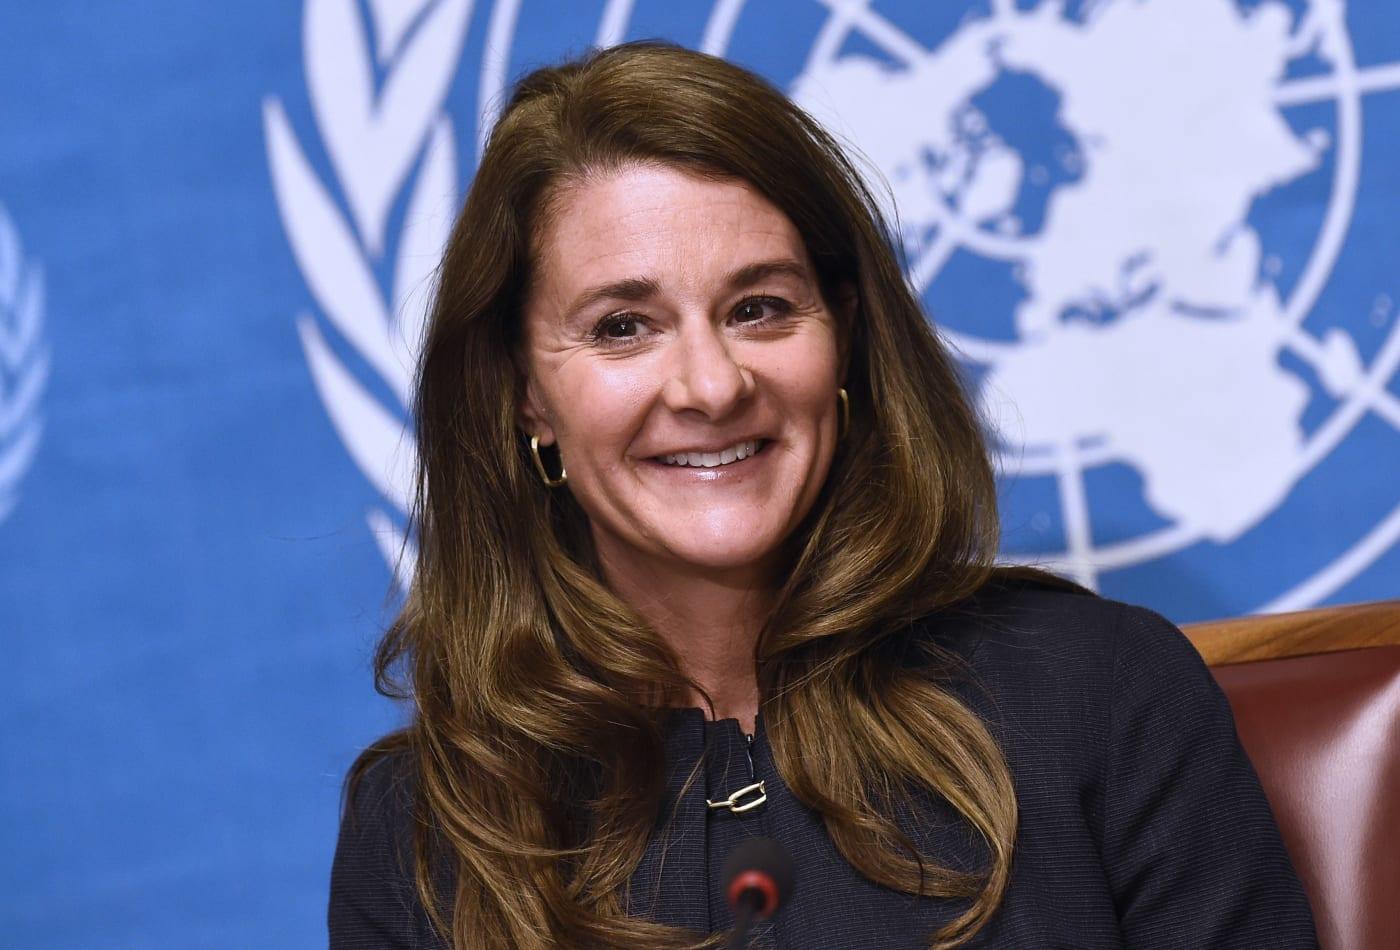 Melinda Gates - Biography, Height & Life Story